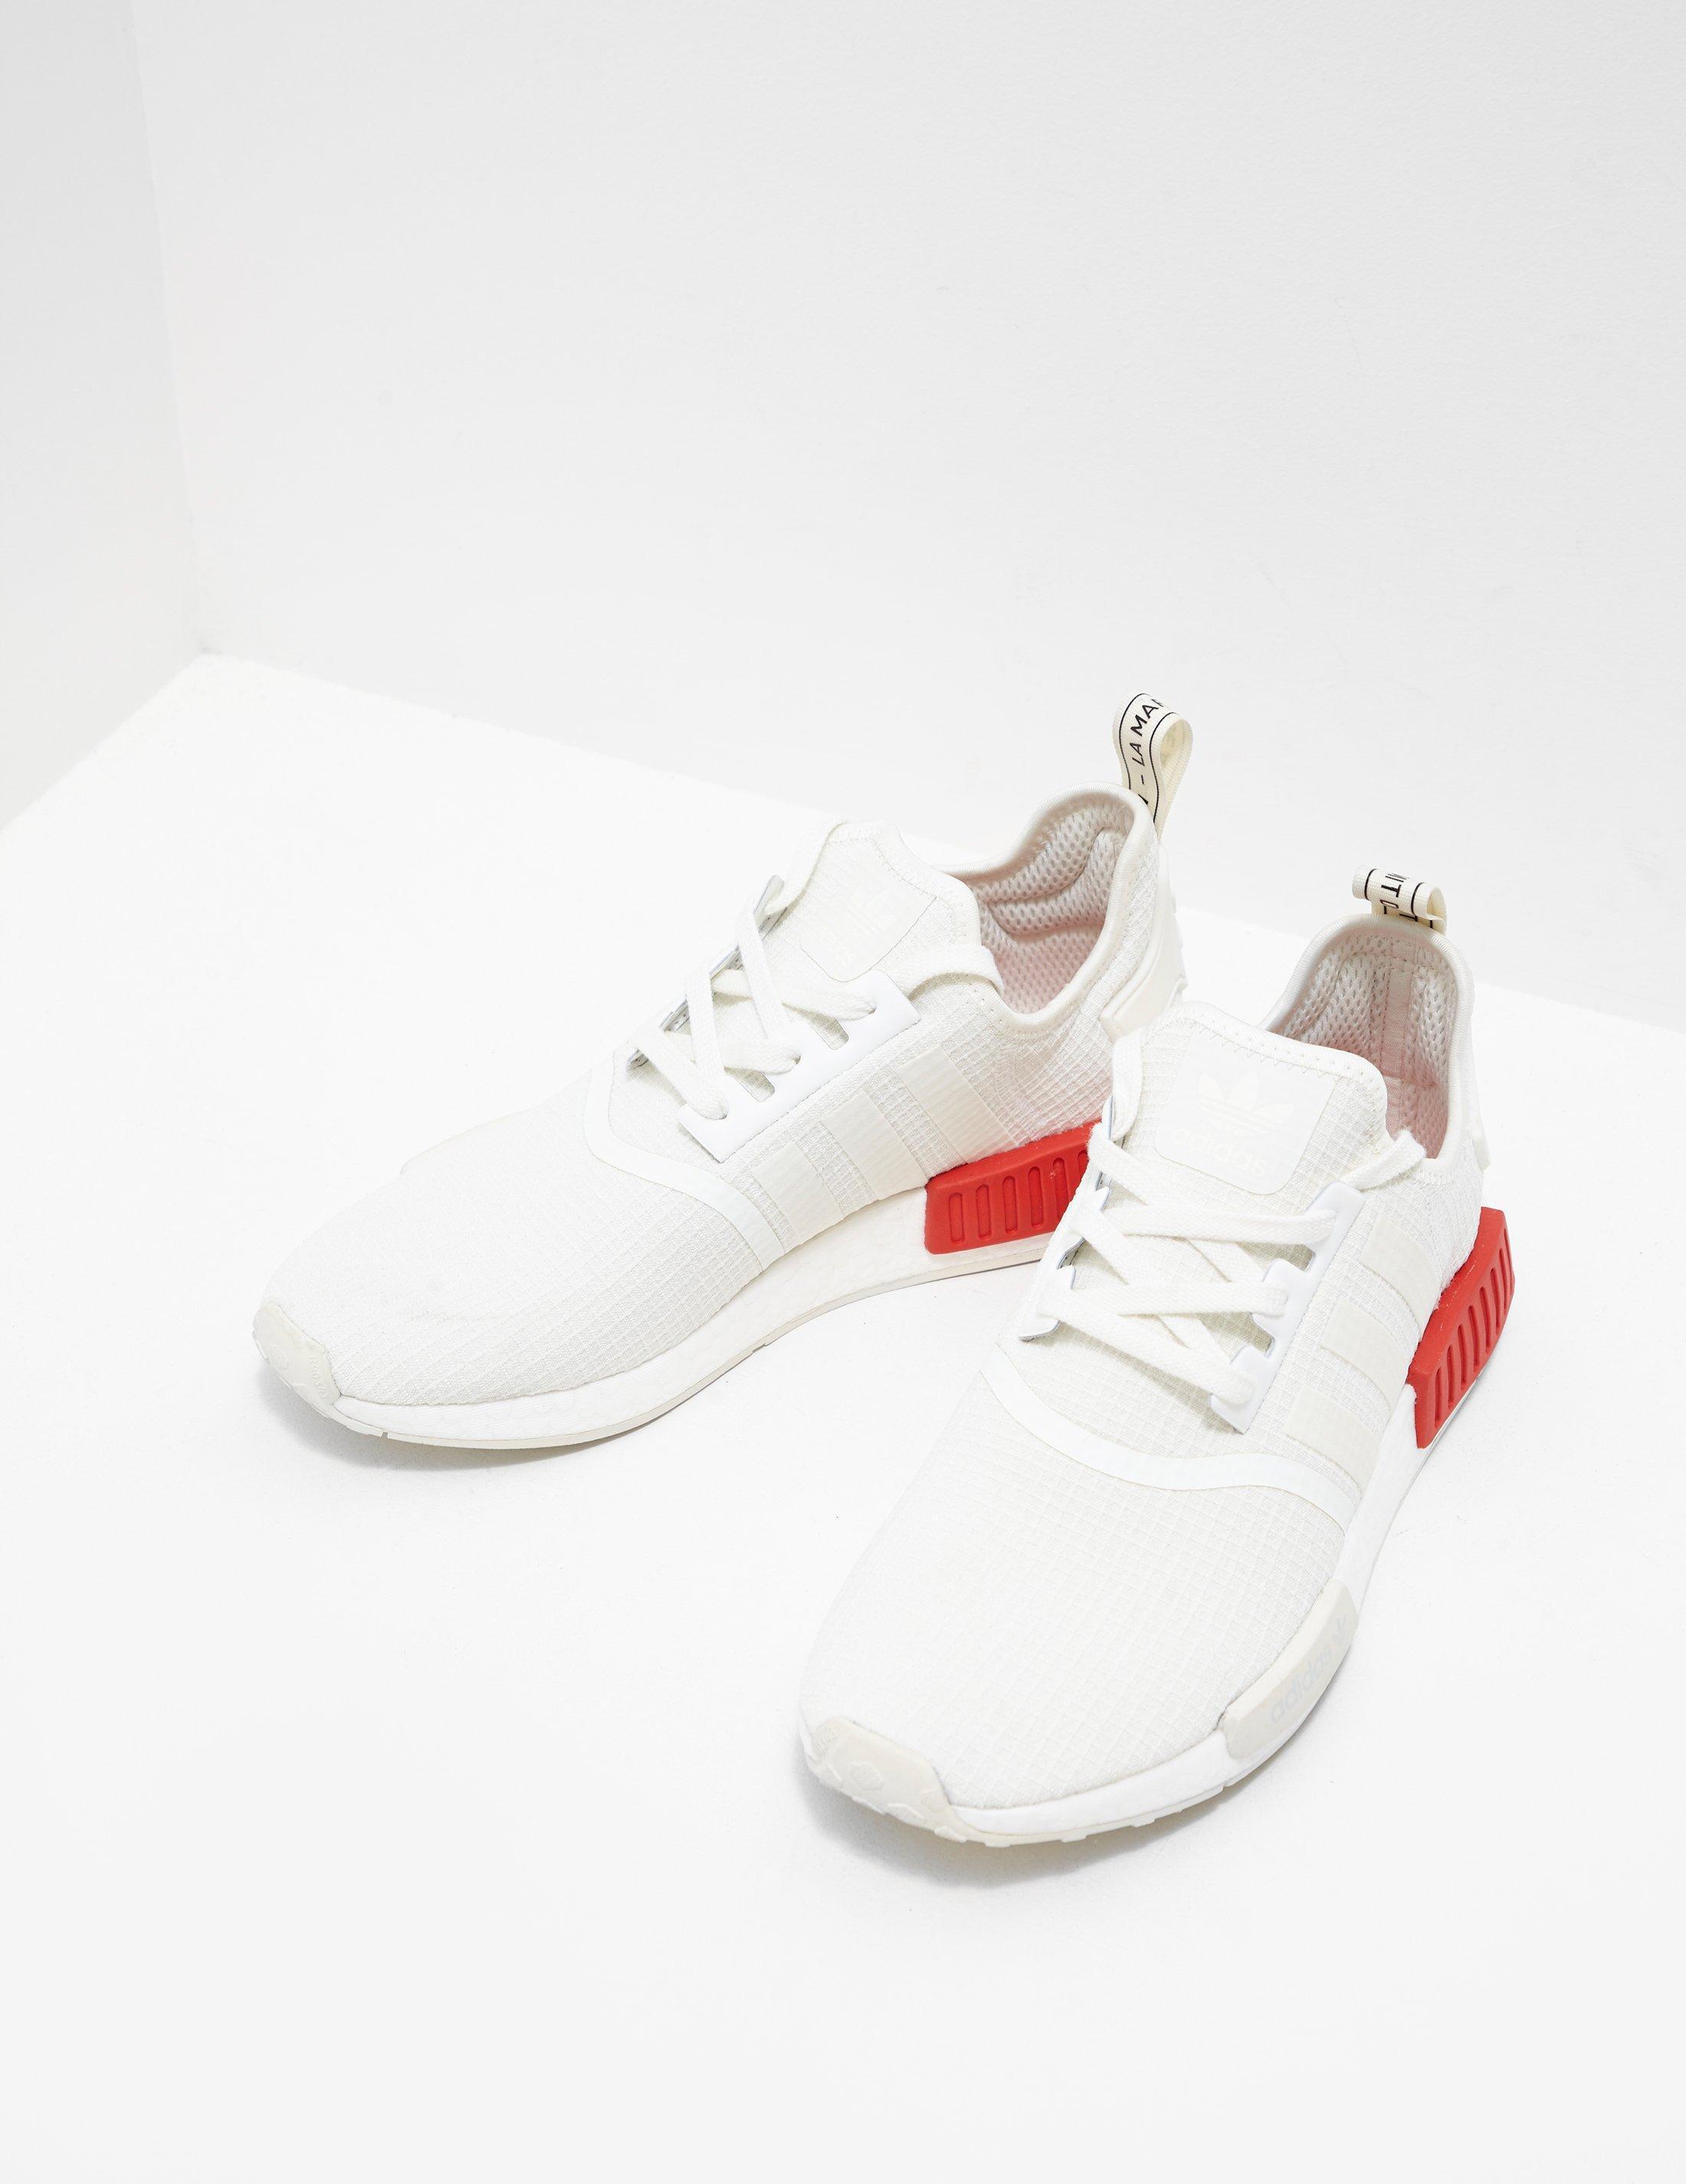 Lyst - adidas Originals Mens Nmd R1 Ripstop White in White for Men 6e6c0ed74